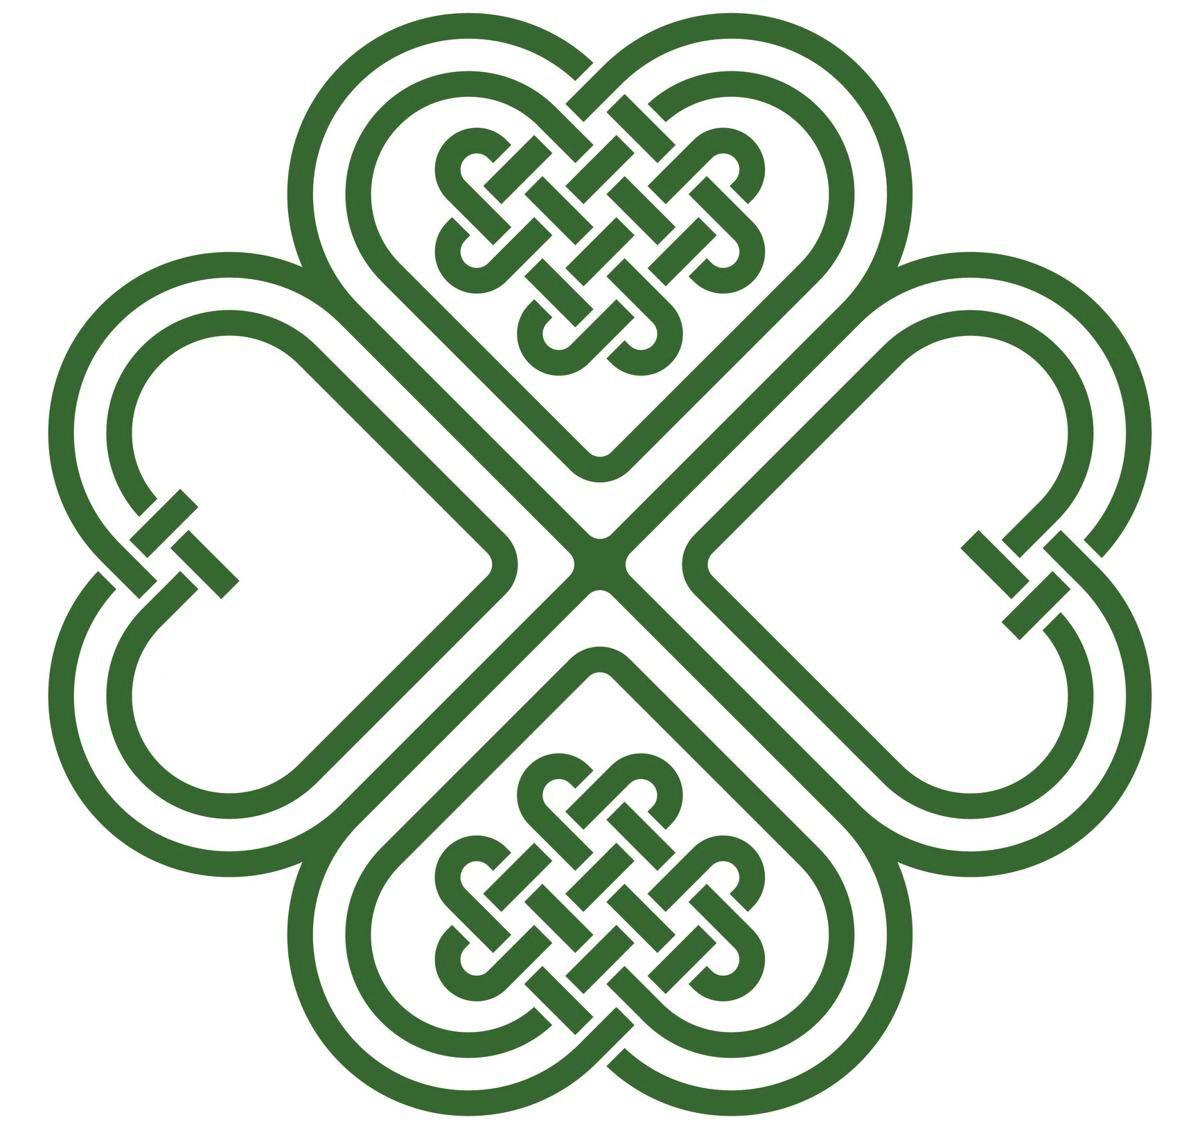 Green celtic knot tattoo tattoos pinterest celtic celtic knot